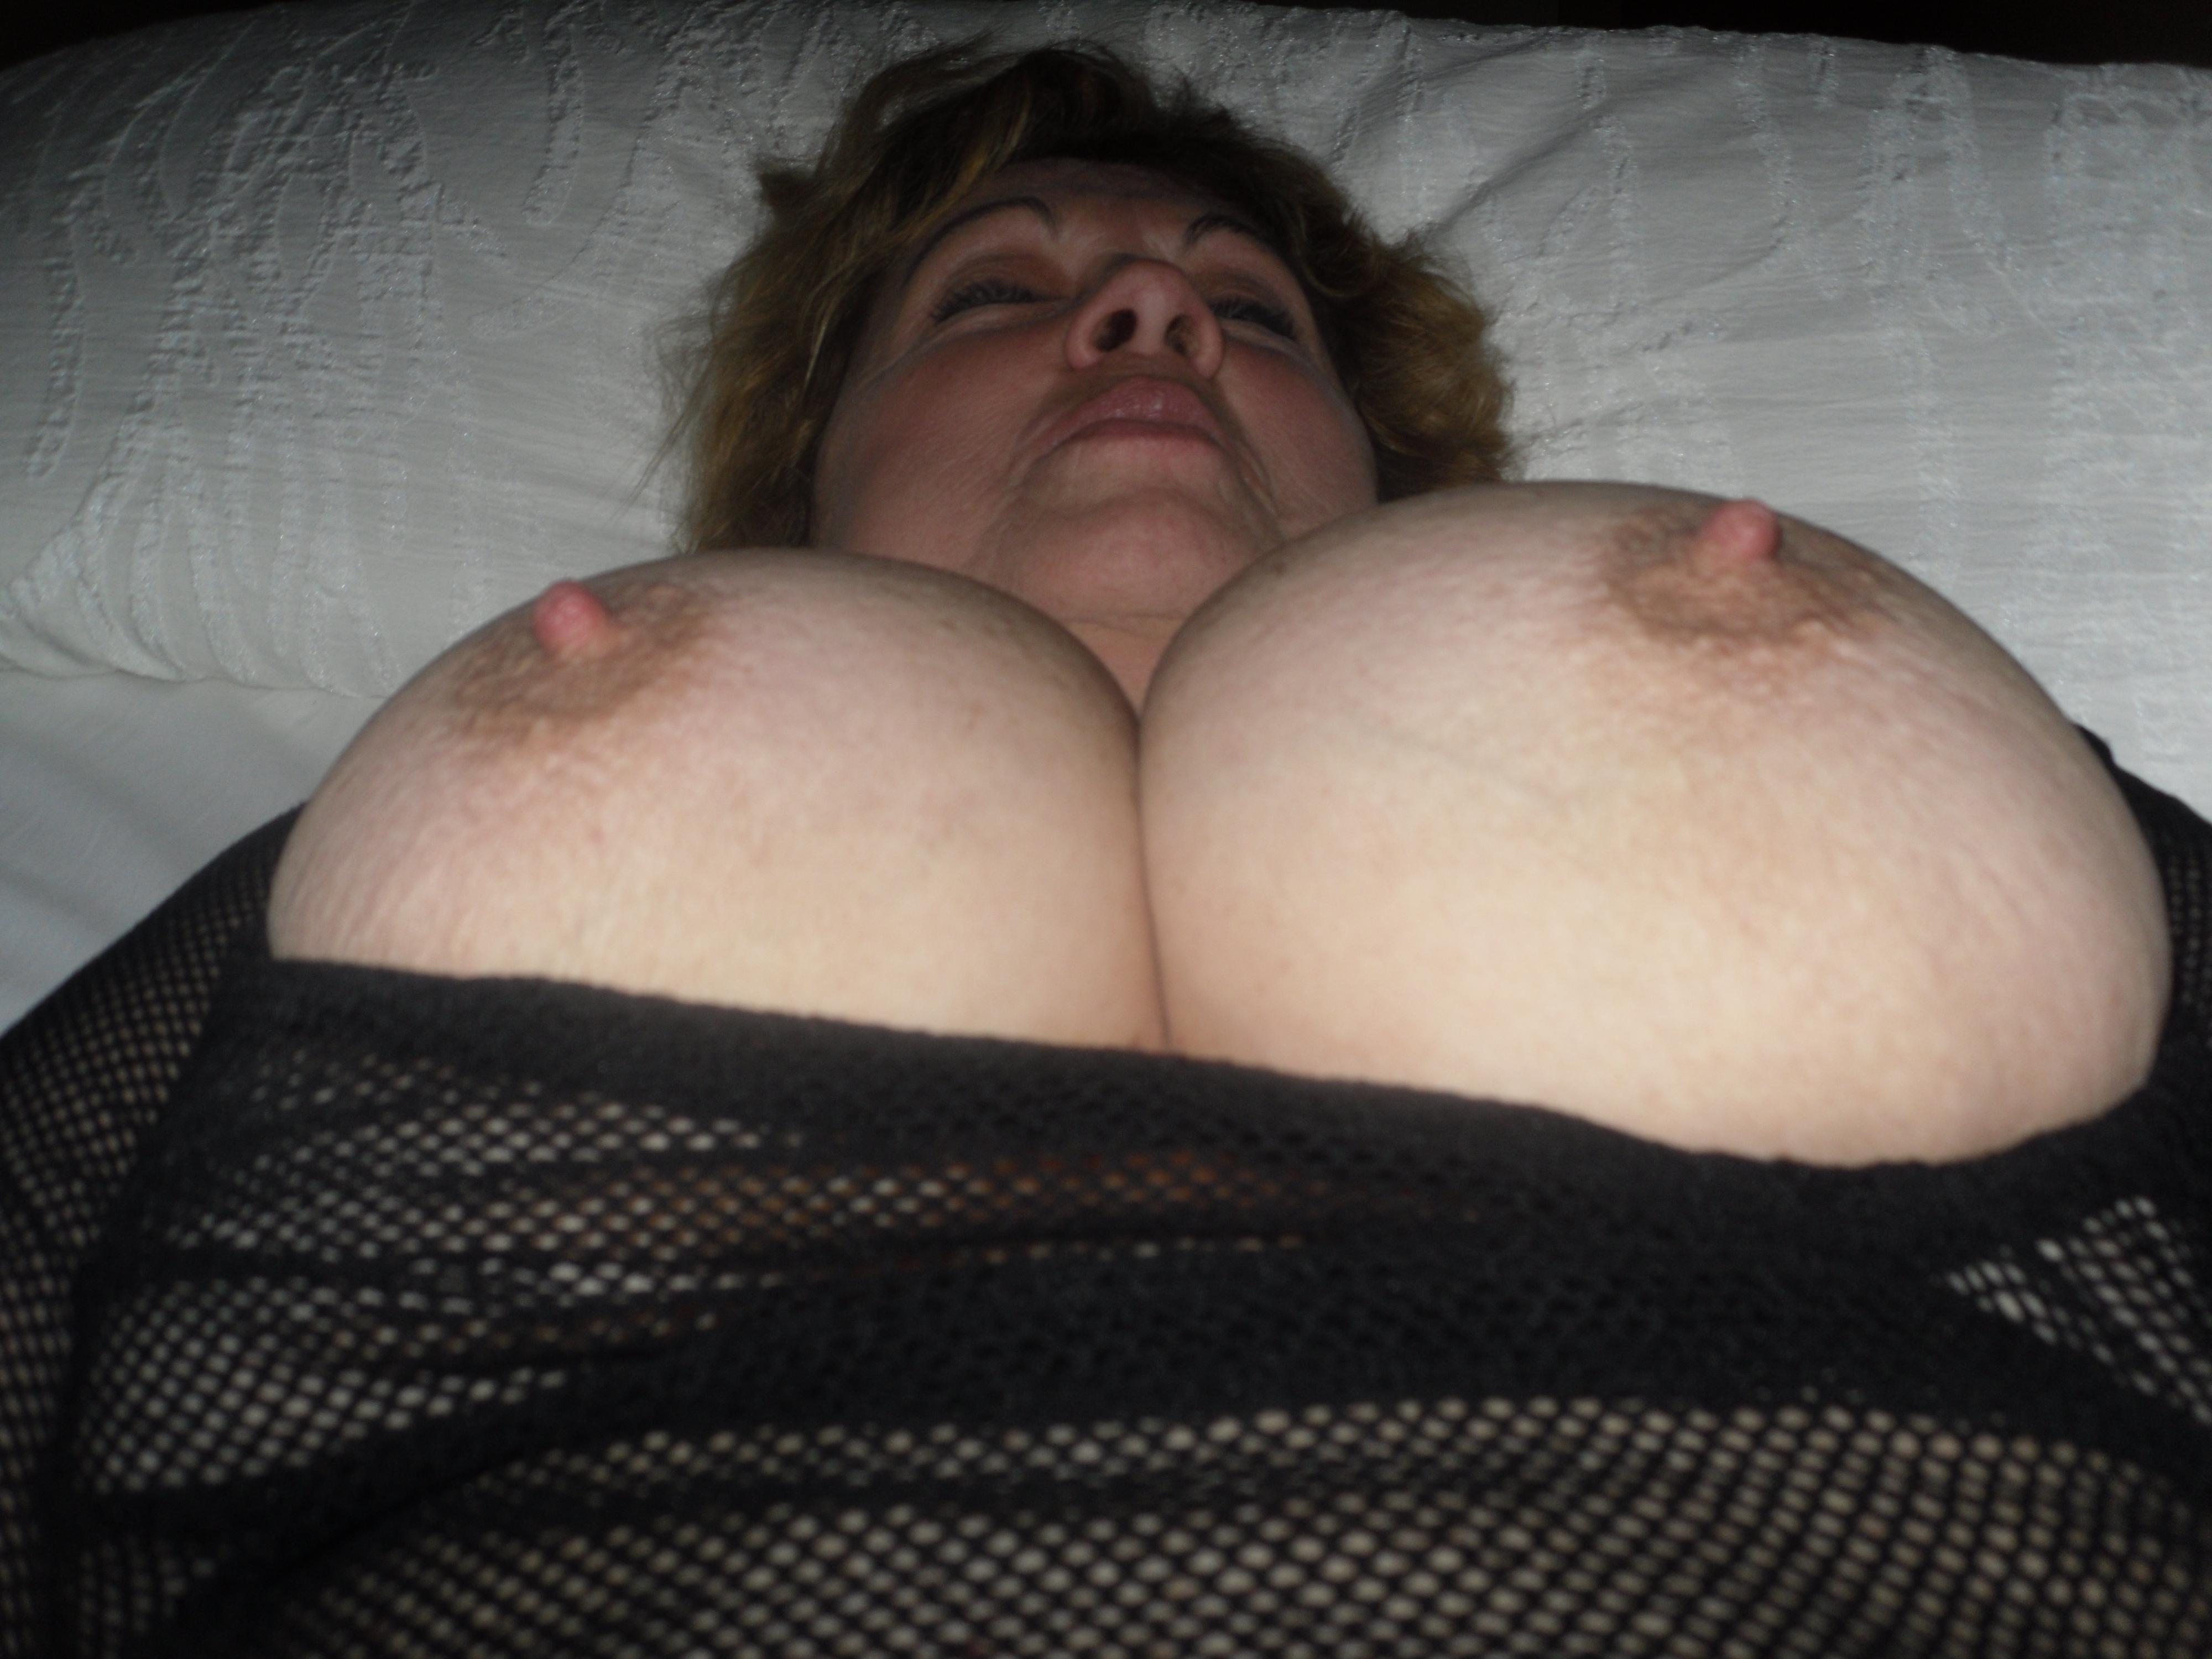 Big pushi blacked sex video girl